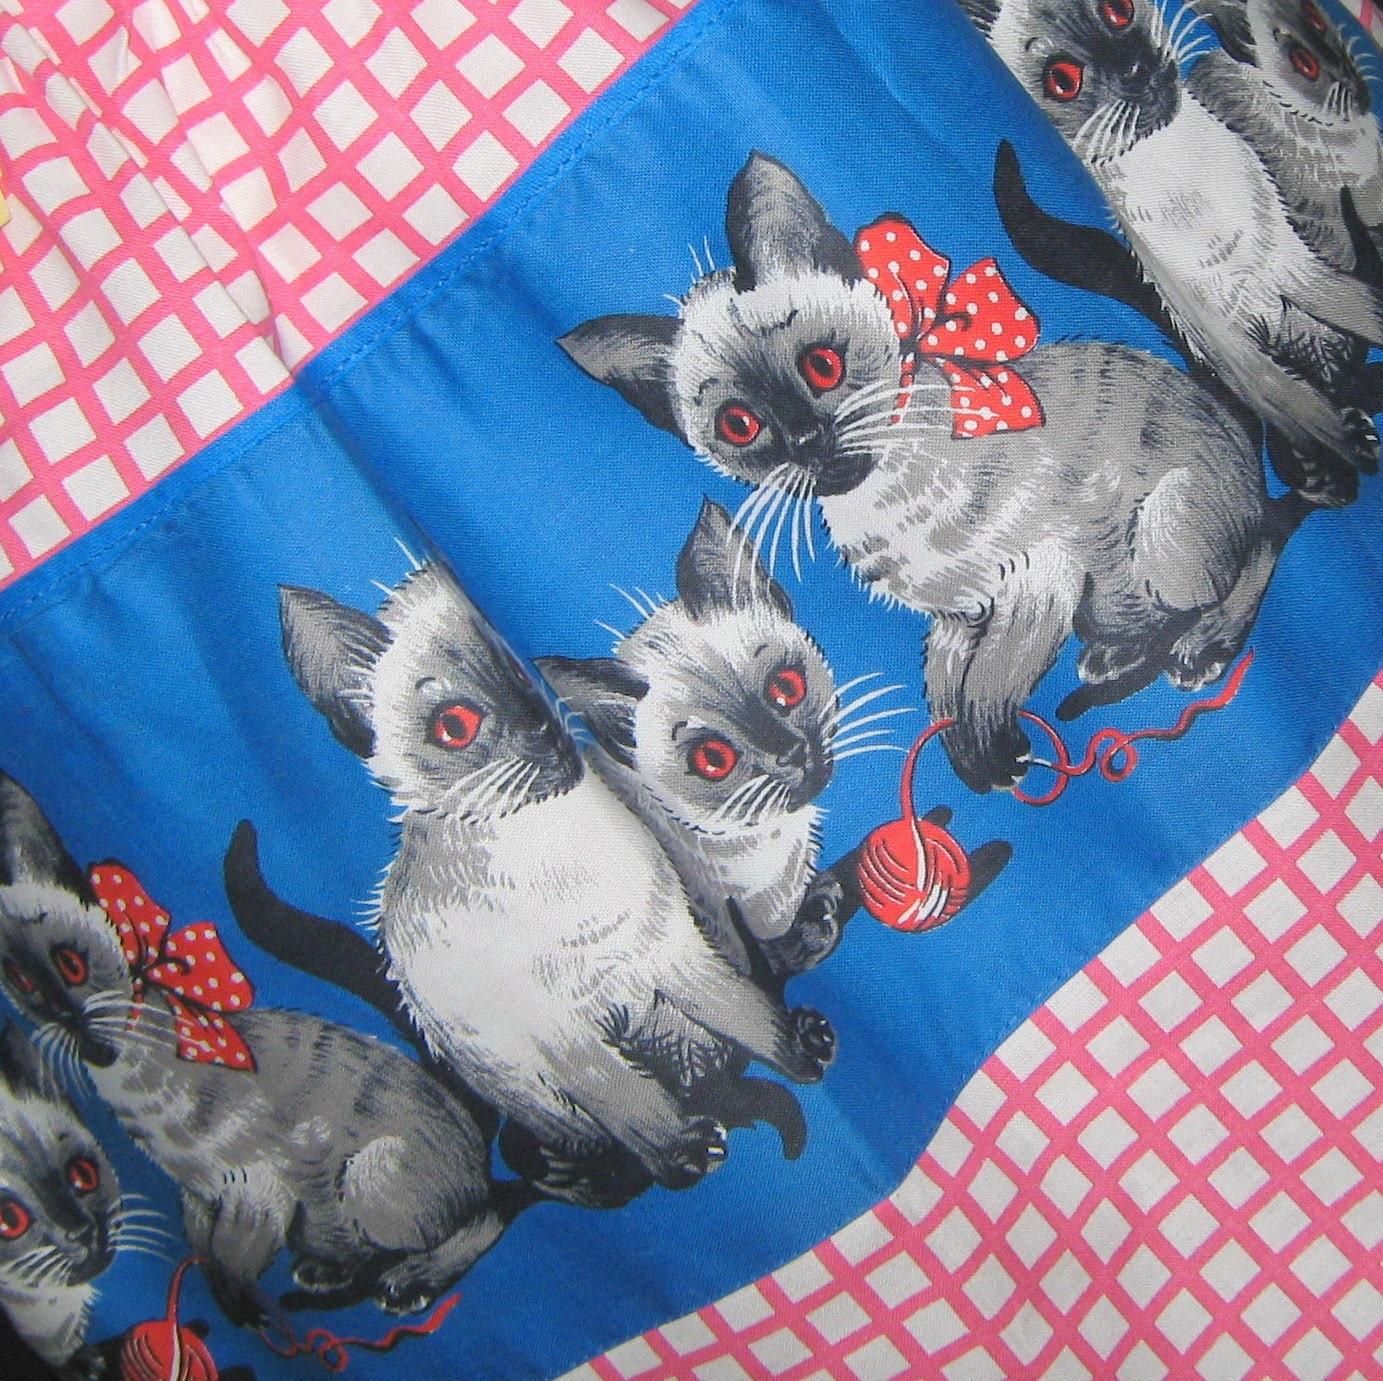 Vintage 1960s 60s Kitten Print Apron Pink White Cotton NOS Deadstock - sewingmachinegirl